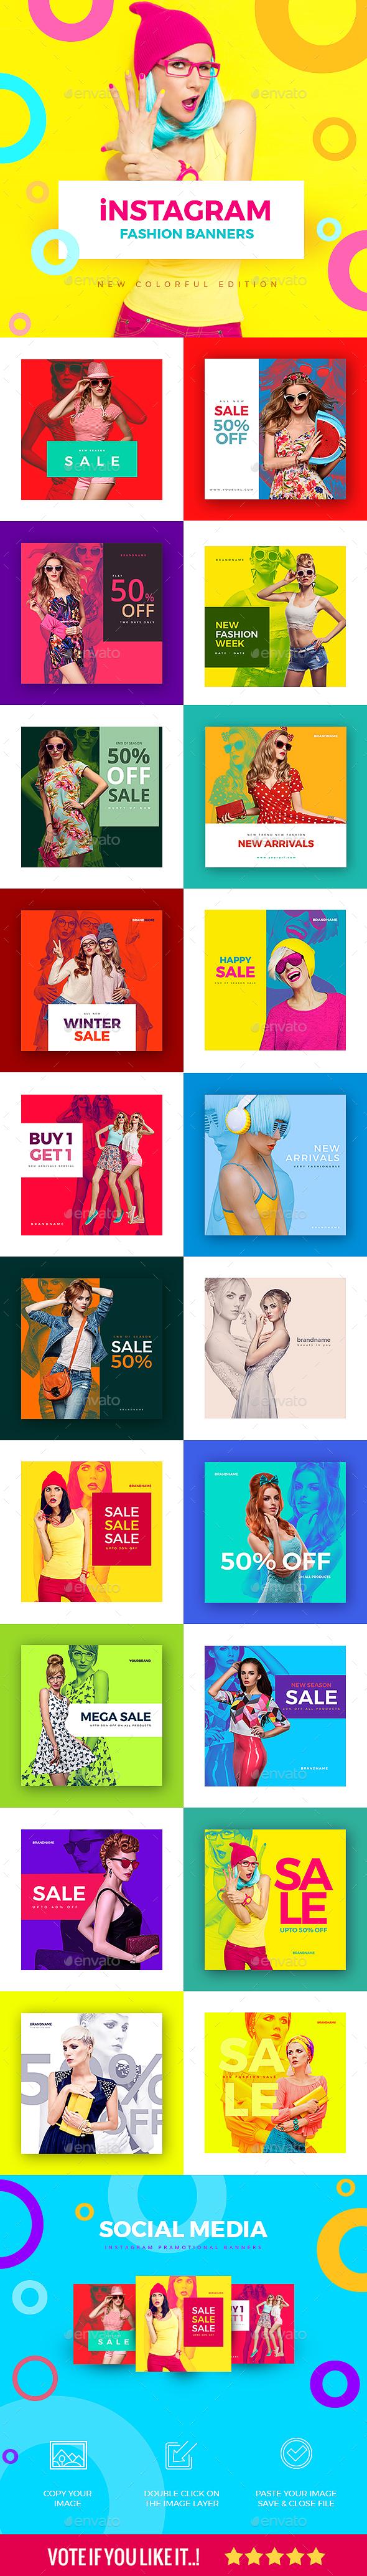 20 Fashion Instagram Banners - Social Media Web Elements